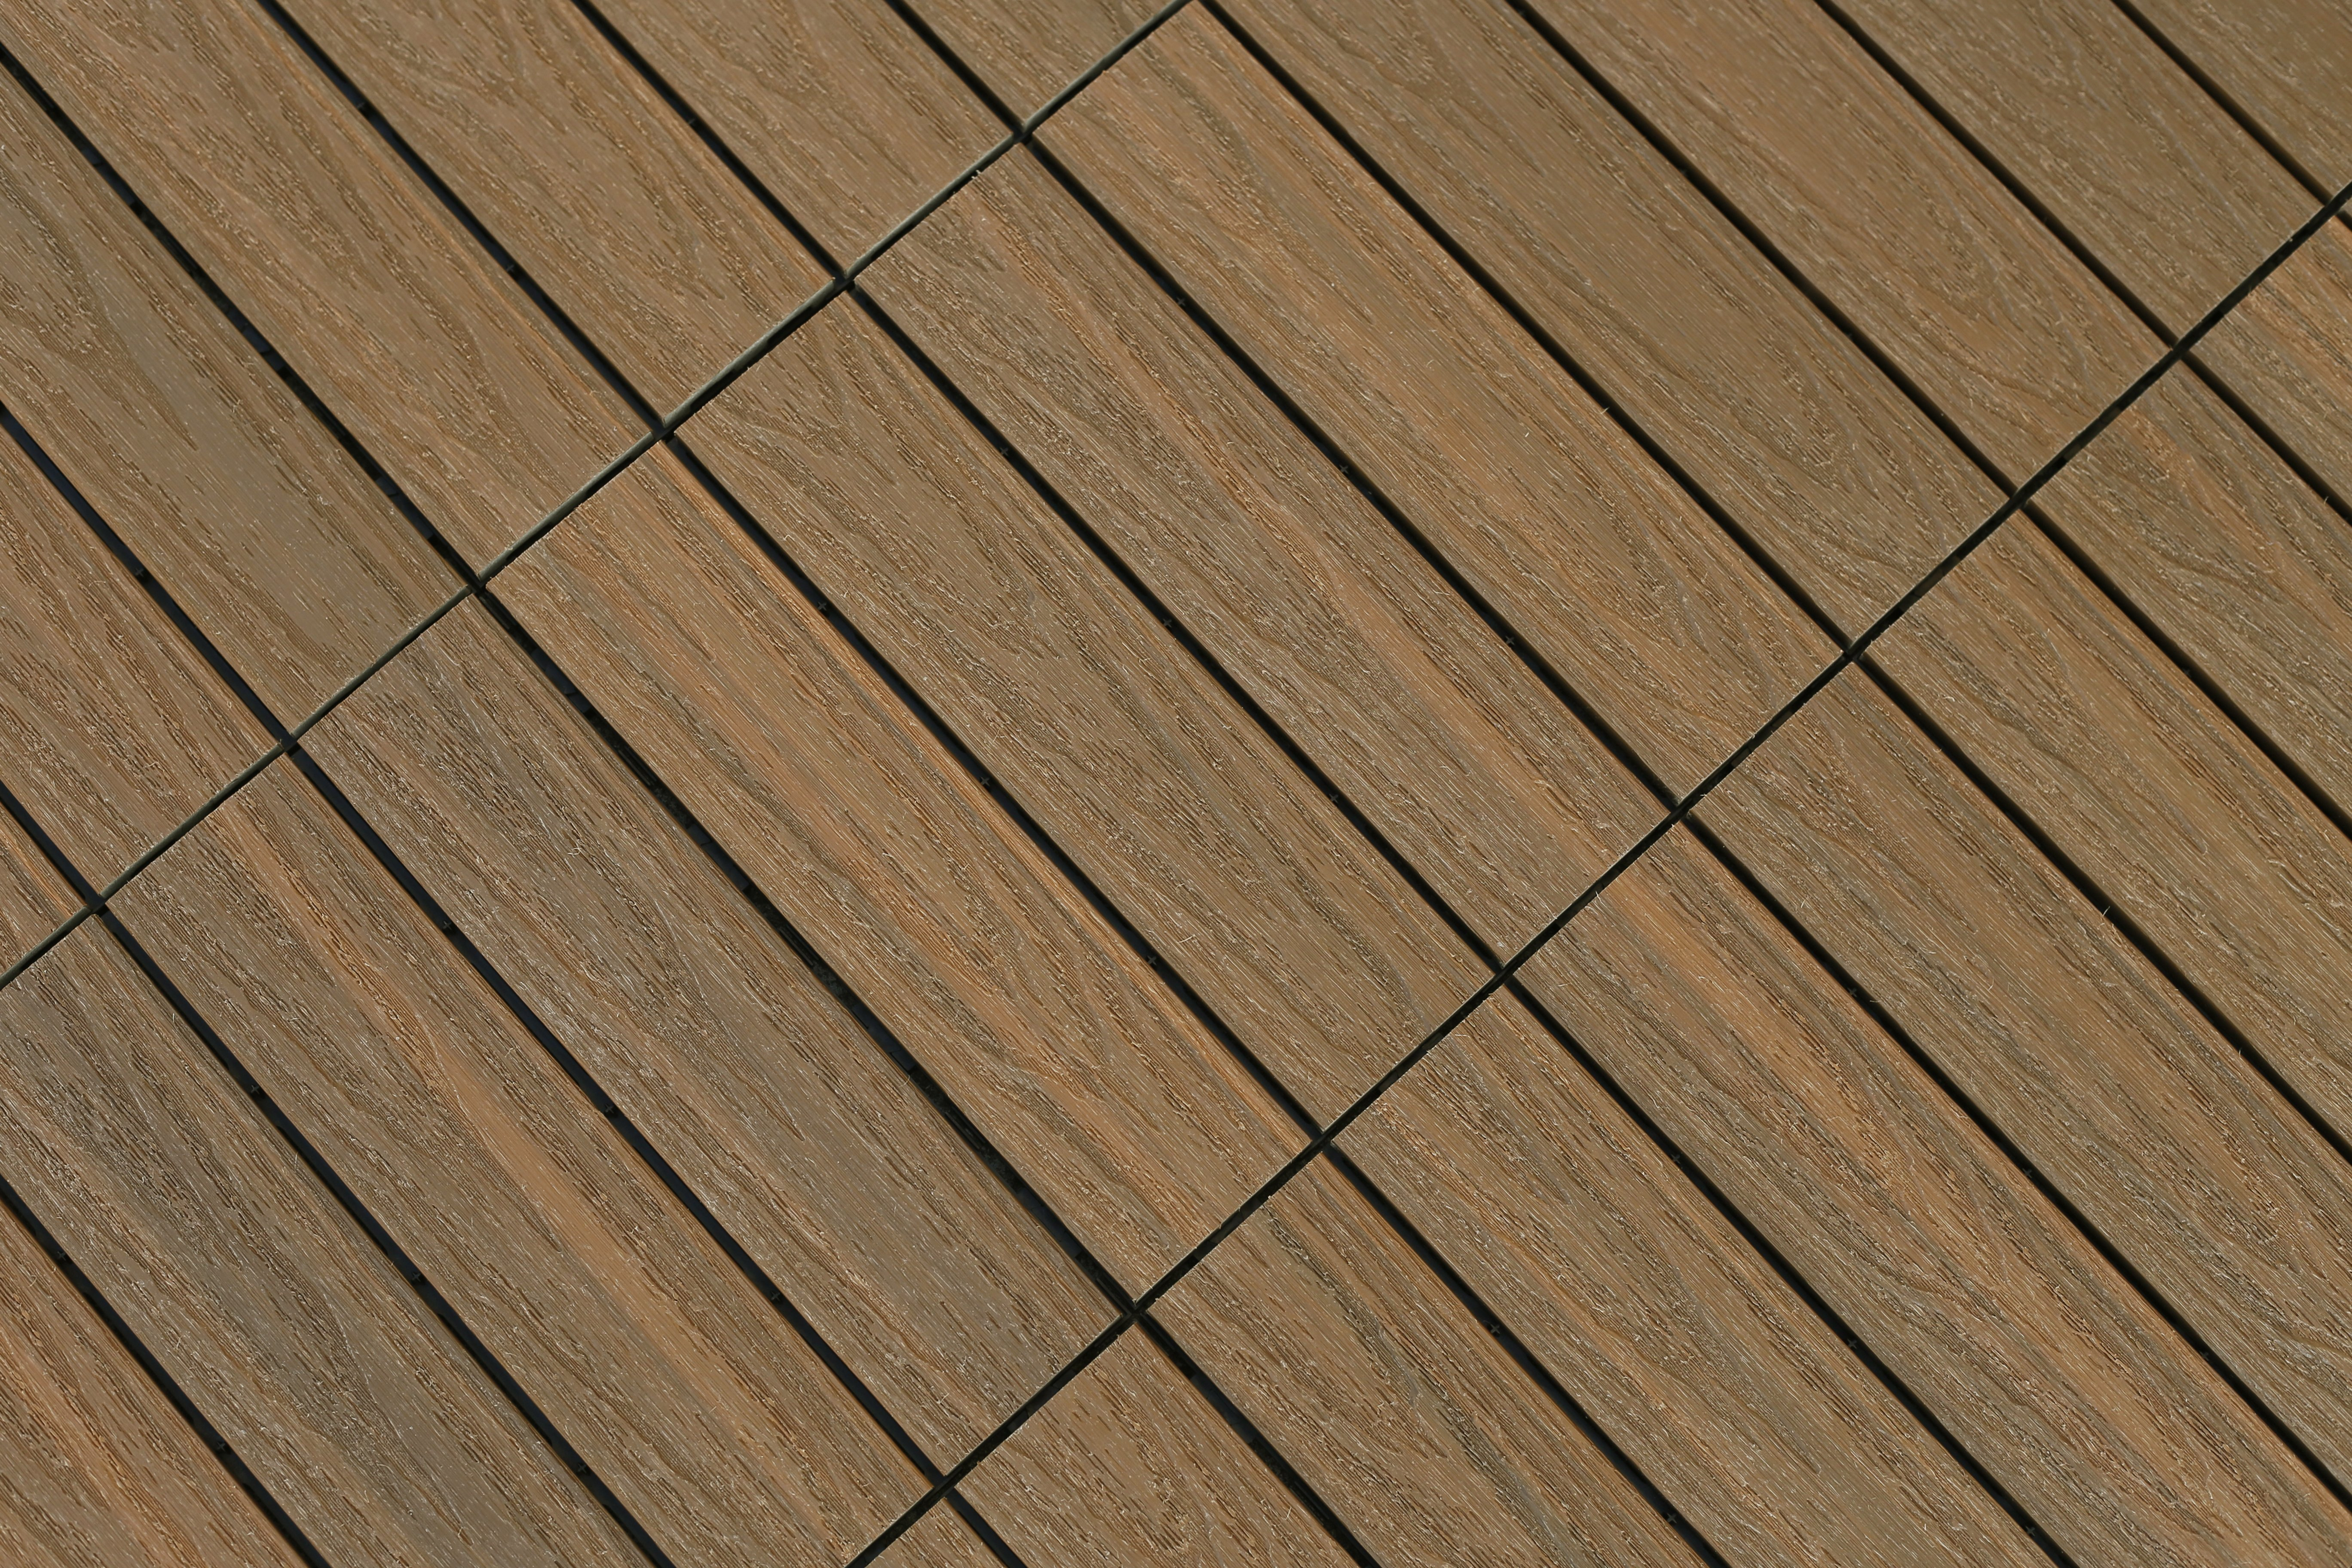 Teak Composite deck tiles